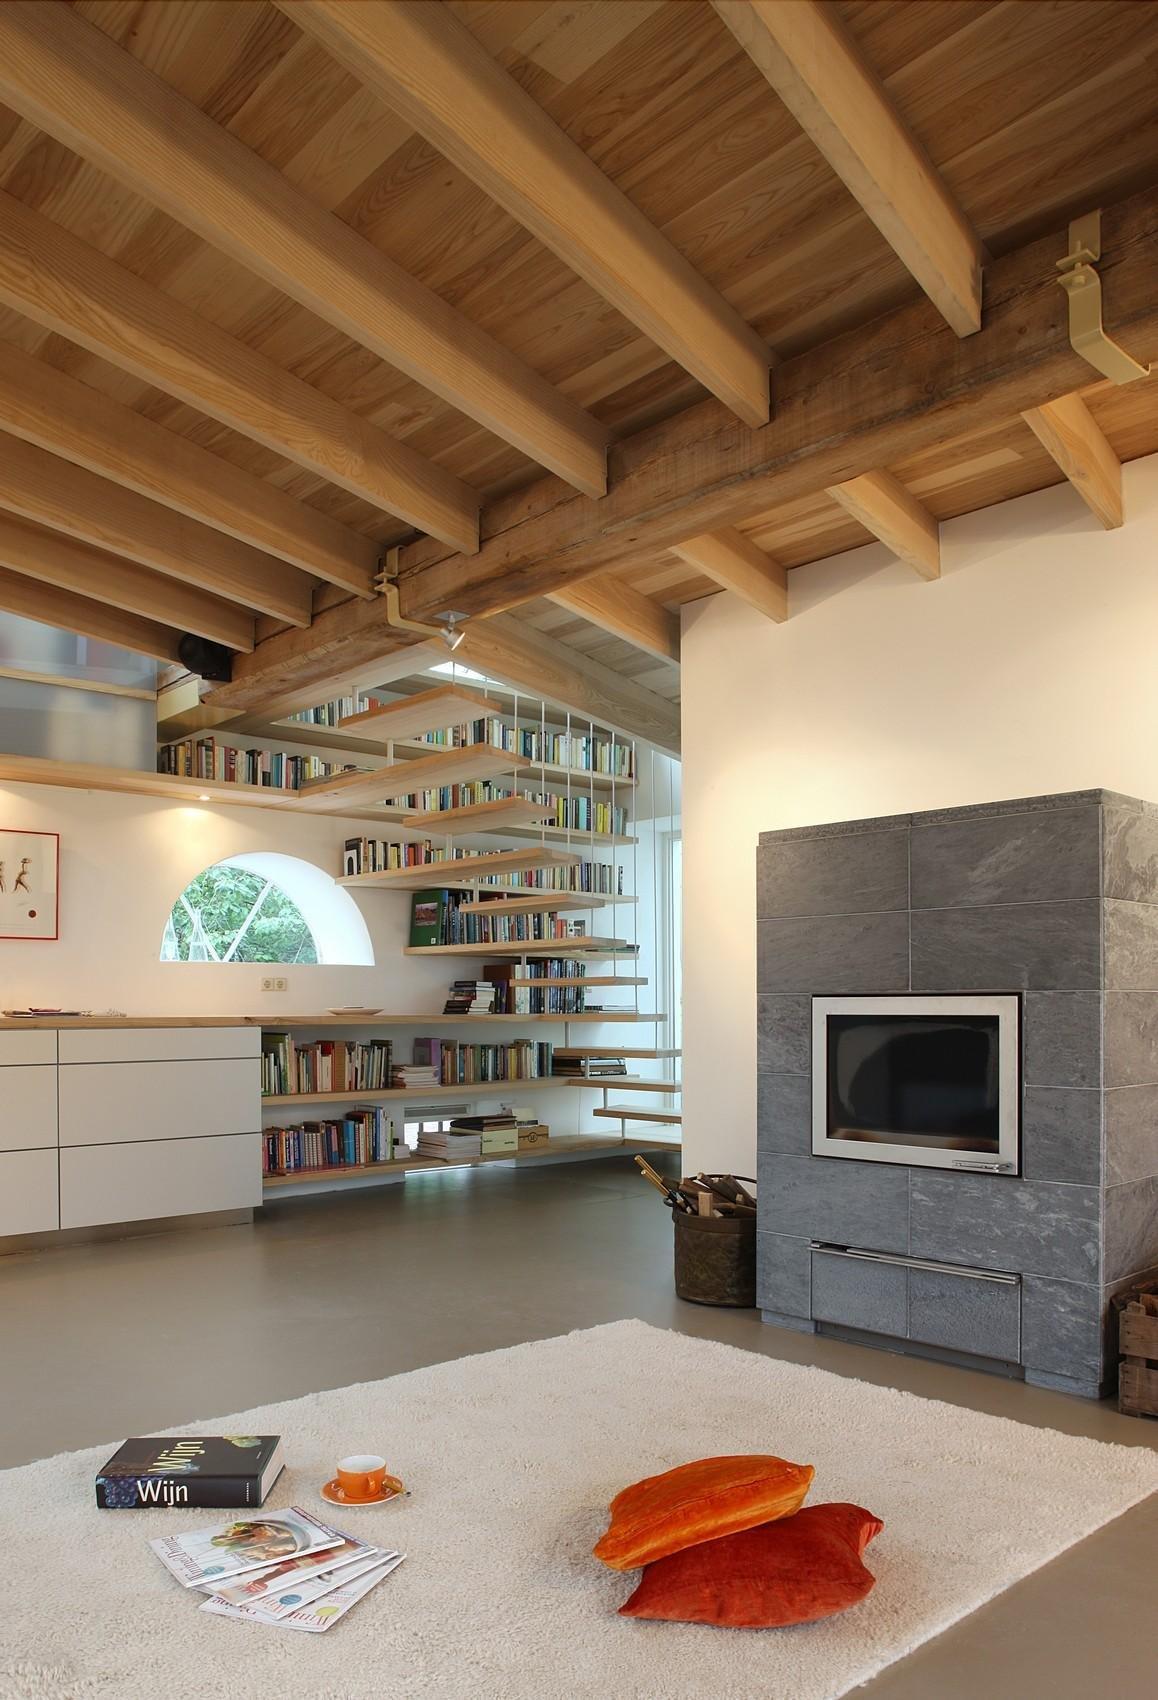 Contemporary Fireplace, Barn Conversion in Geldermalsen, The Netherlands